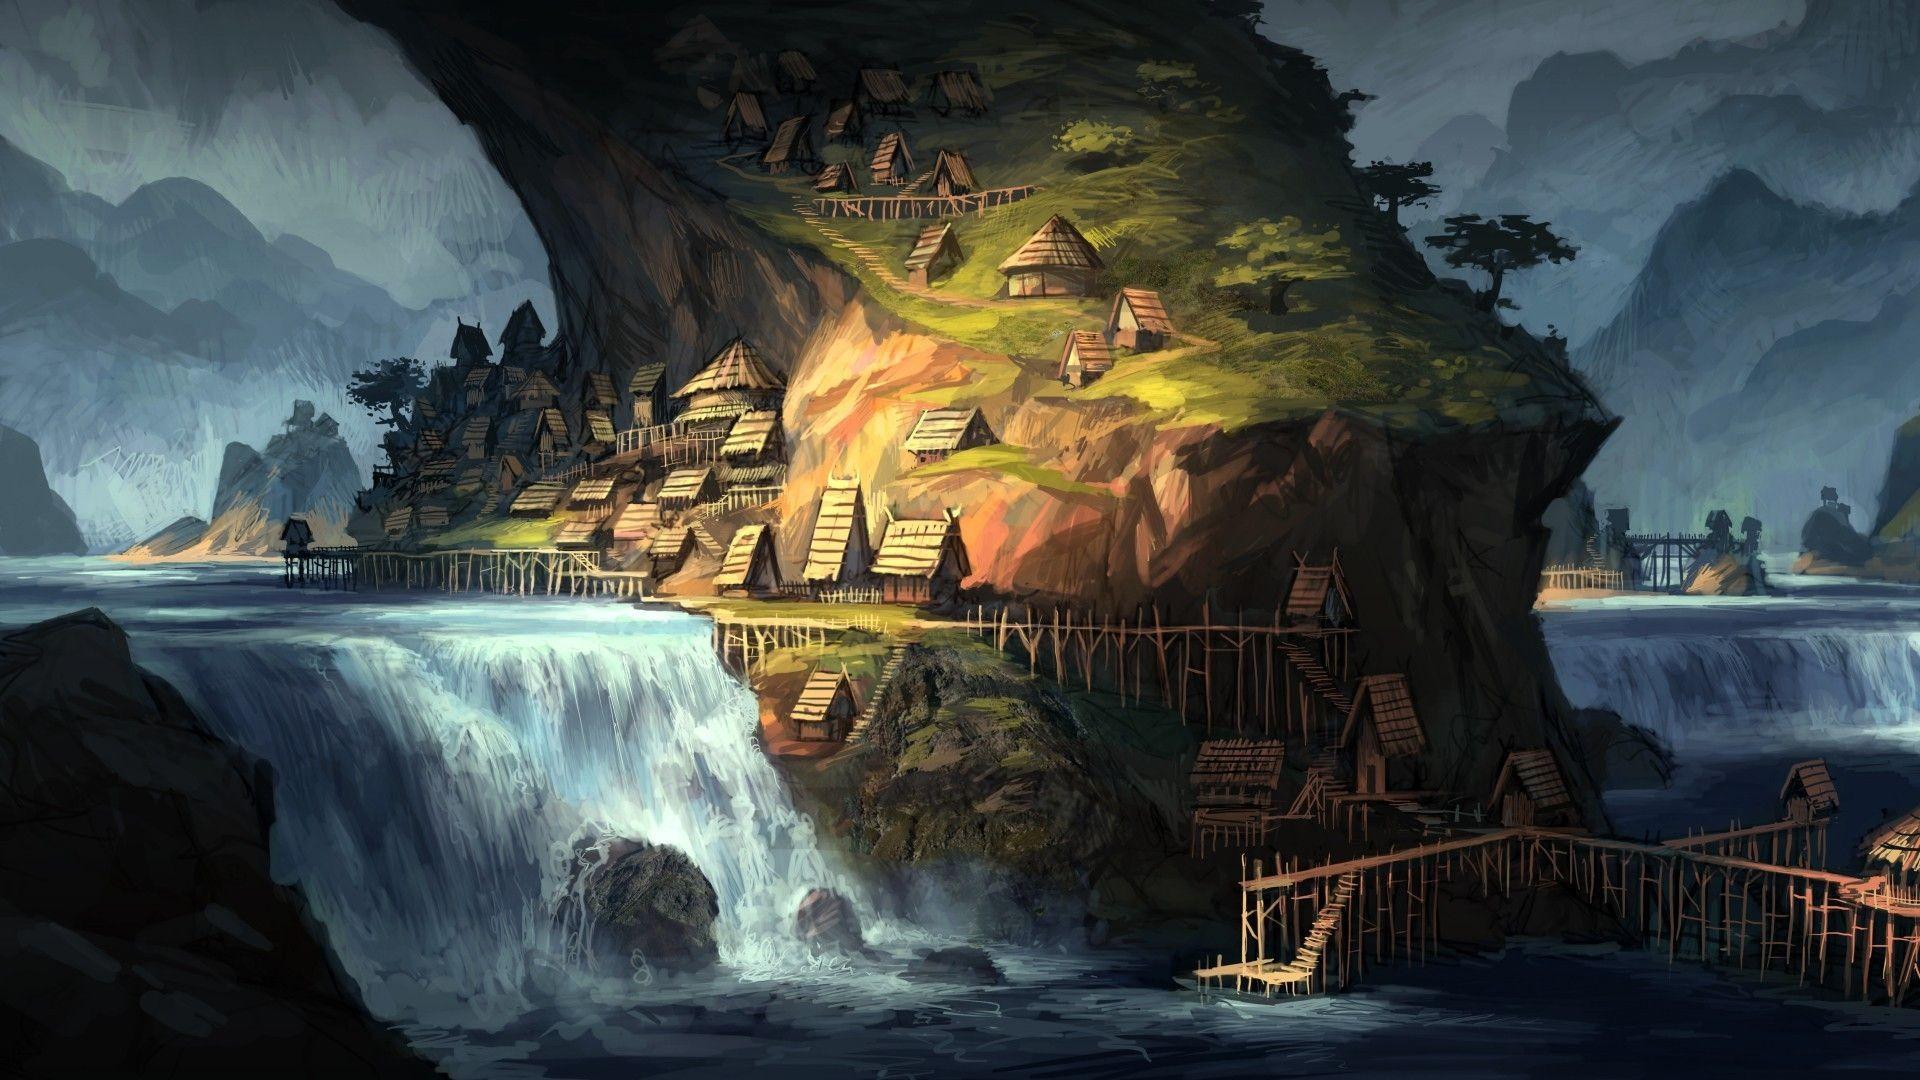 40 Hd Fantasy Ipad Wallpapers: Fantasy Art Wallpaper ·① Download Free Amazing HD